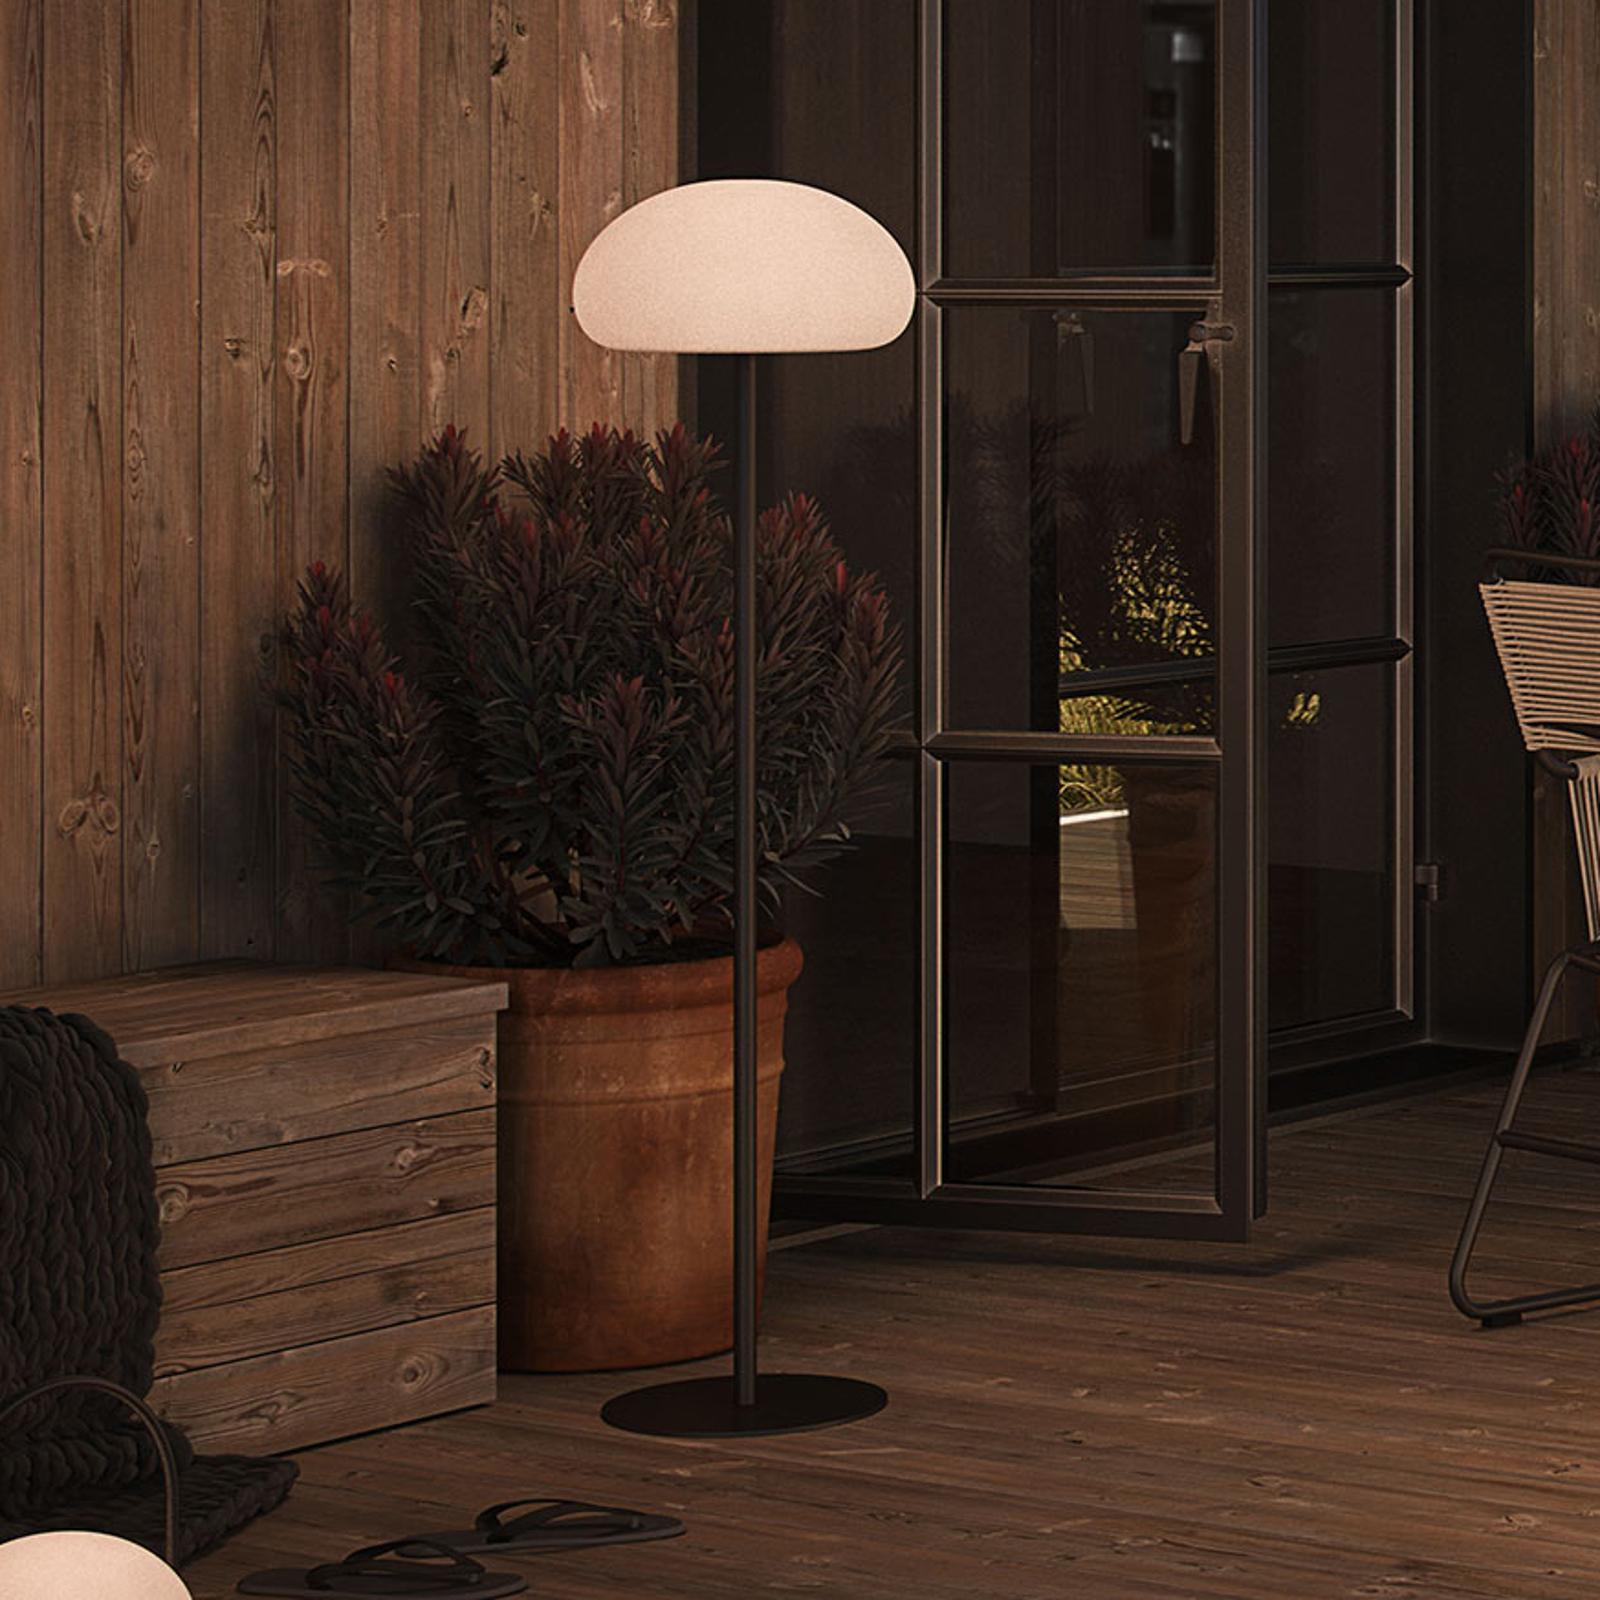 LED stojací lampa Sponge floor na terasu